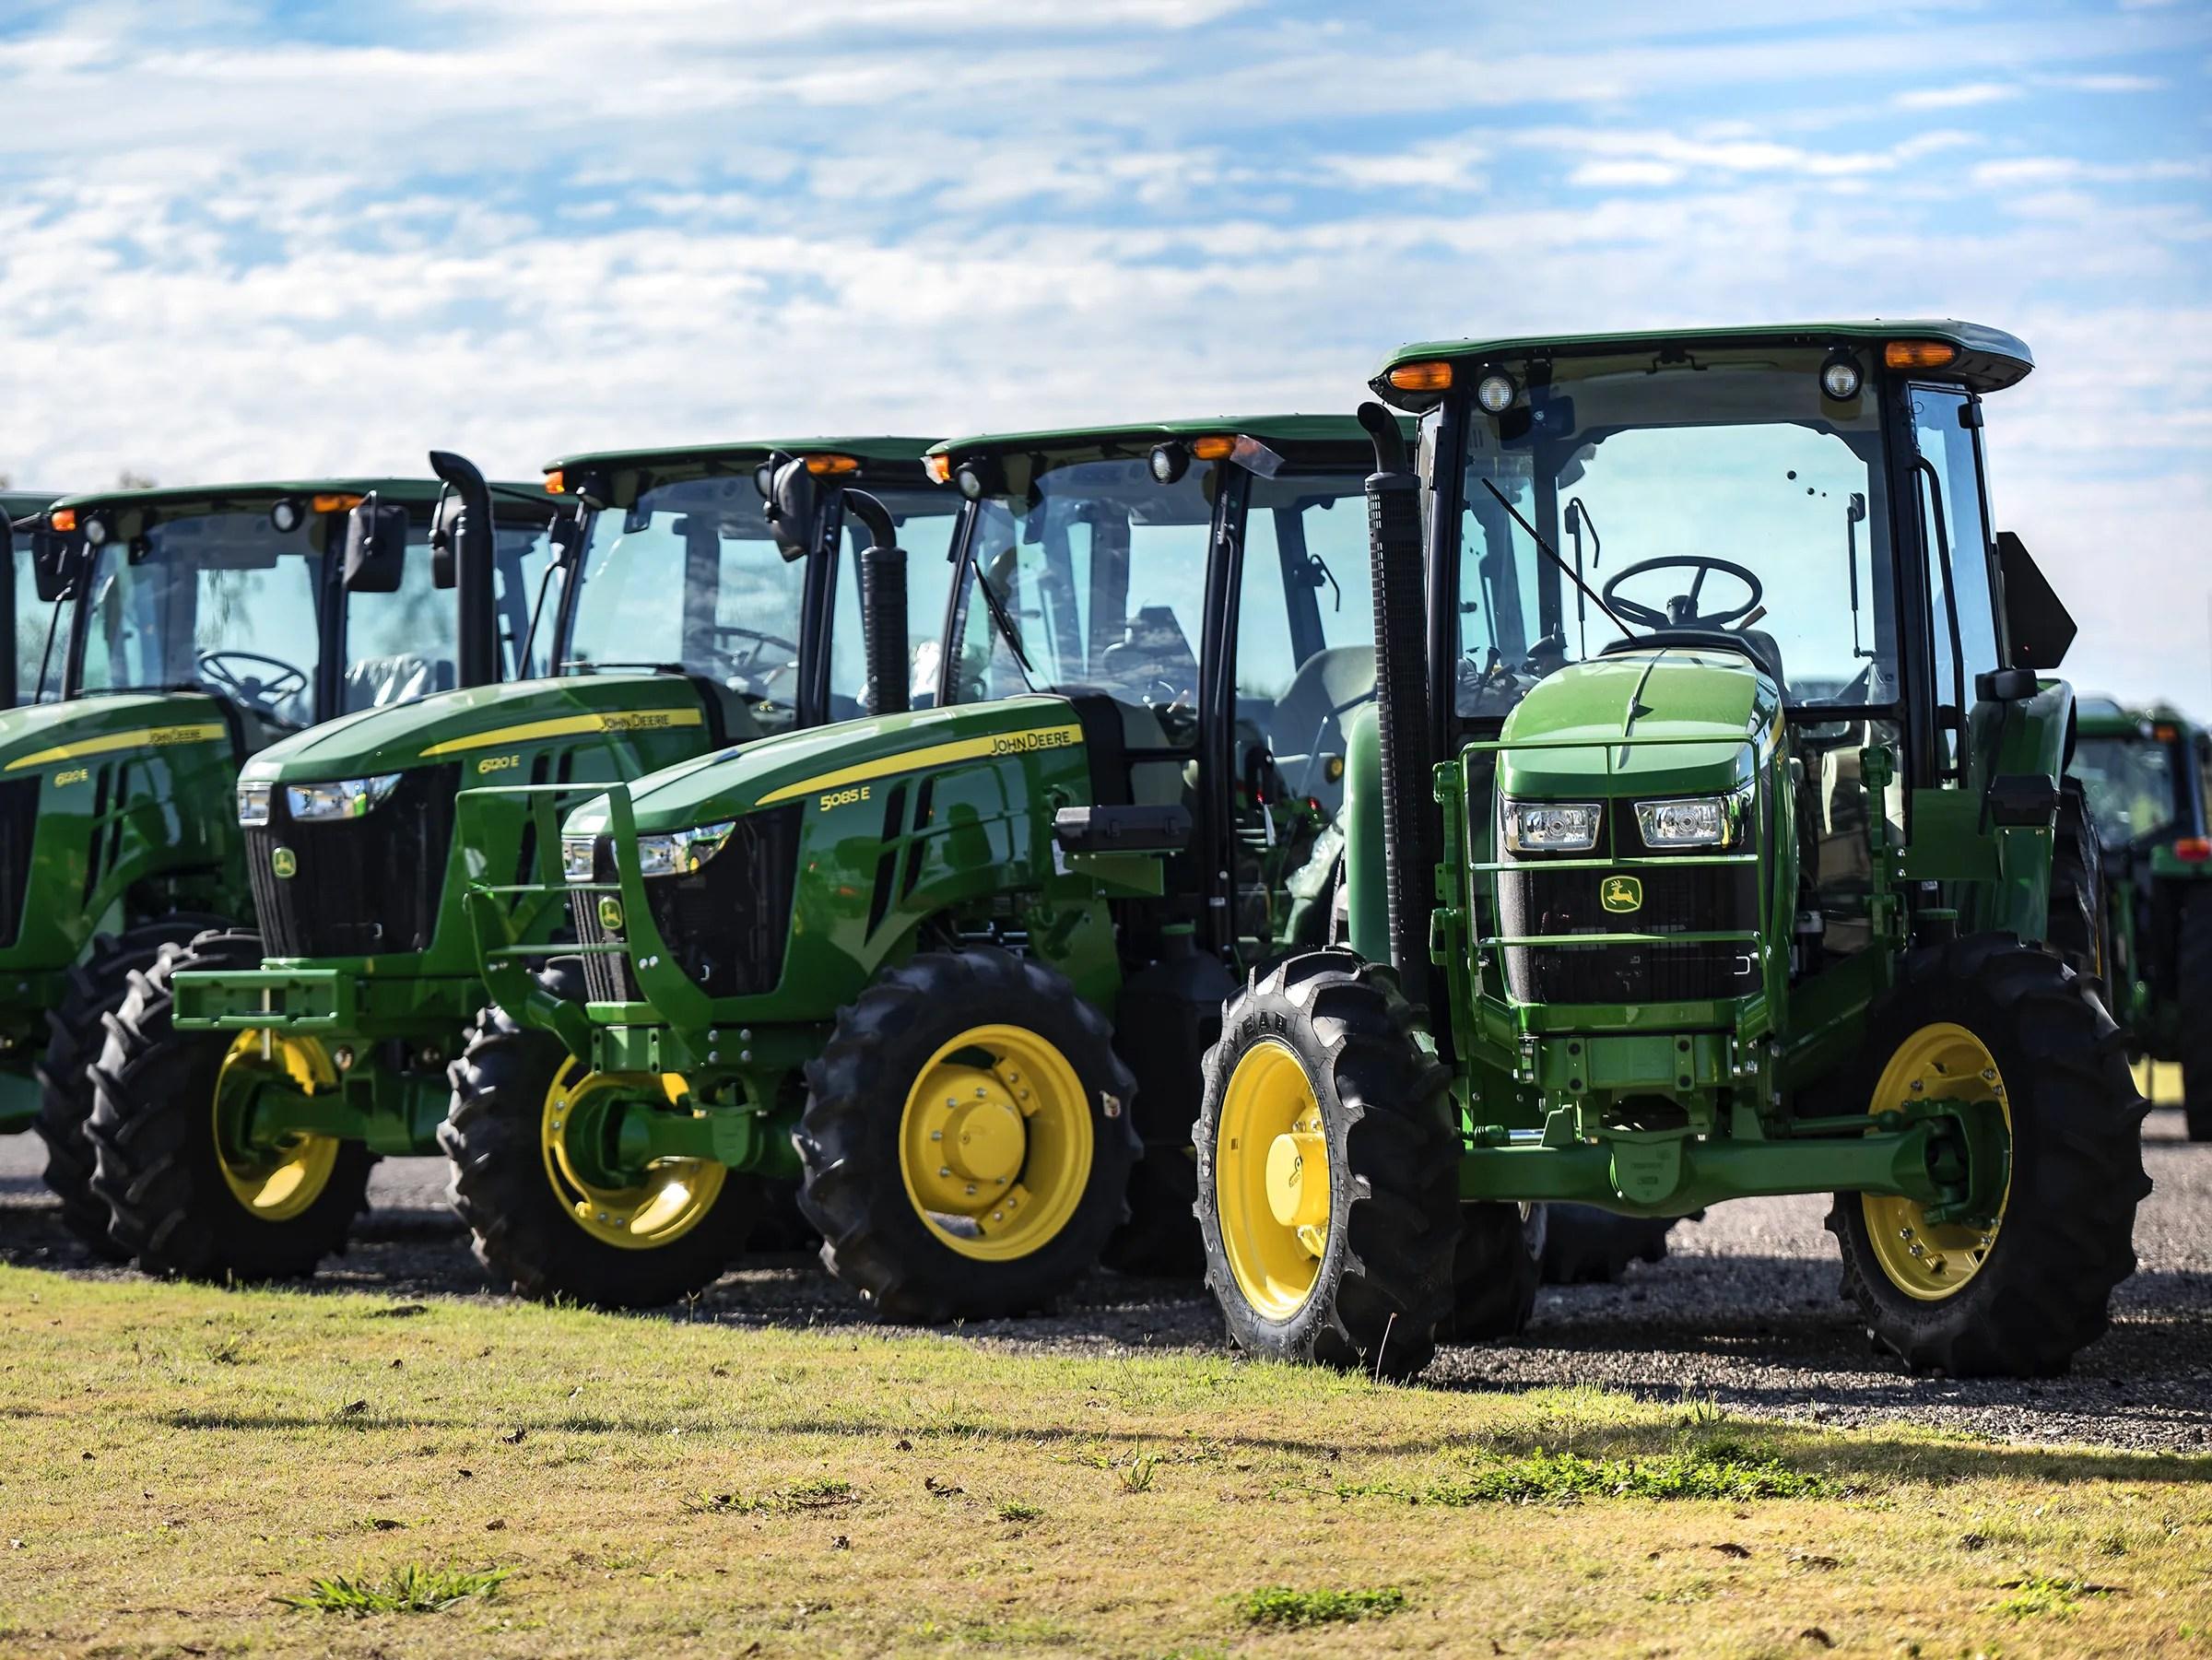 John Deere Just Cost Farmers Their Right To Repair